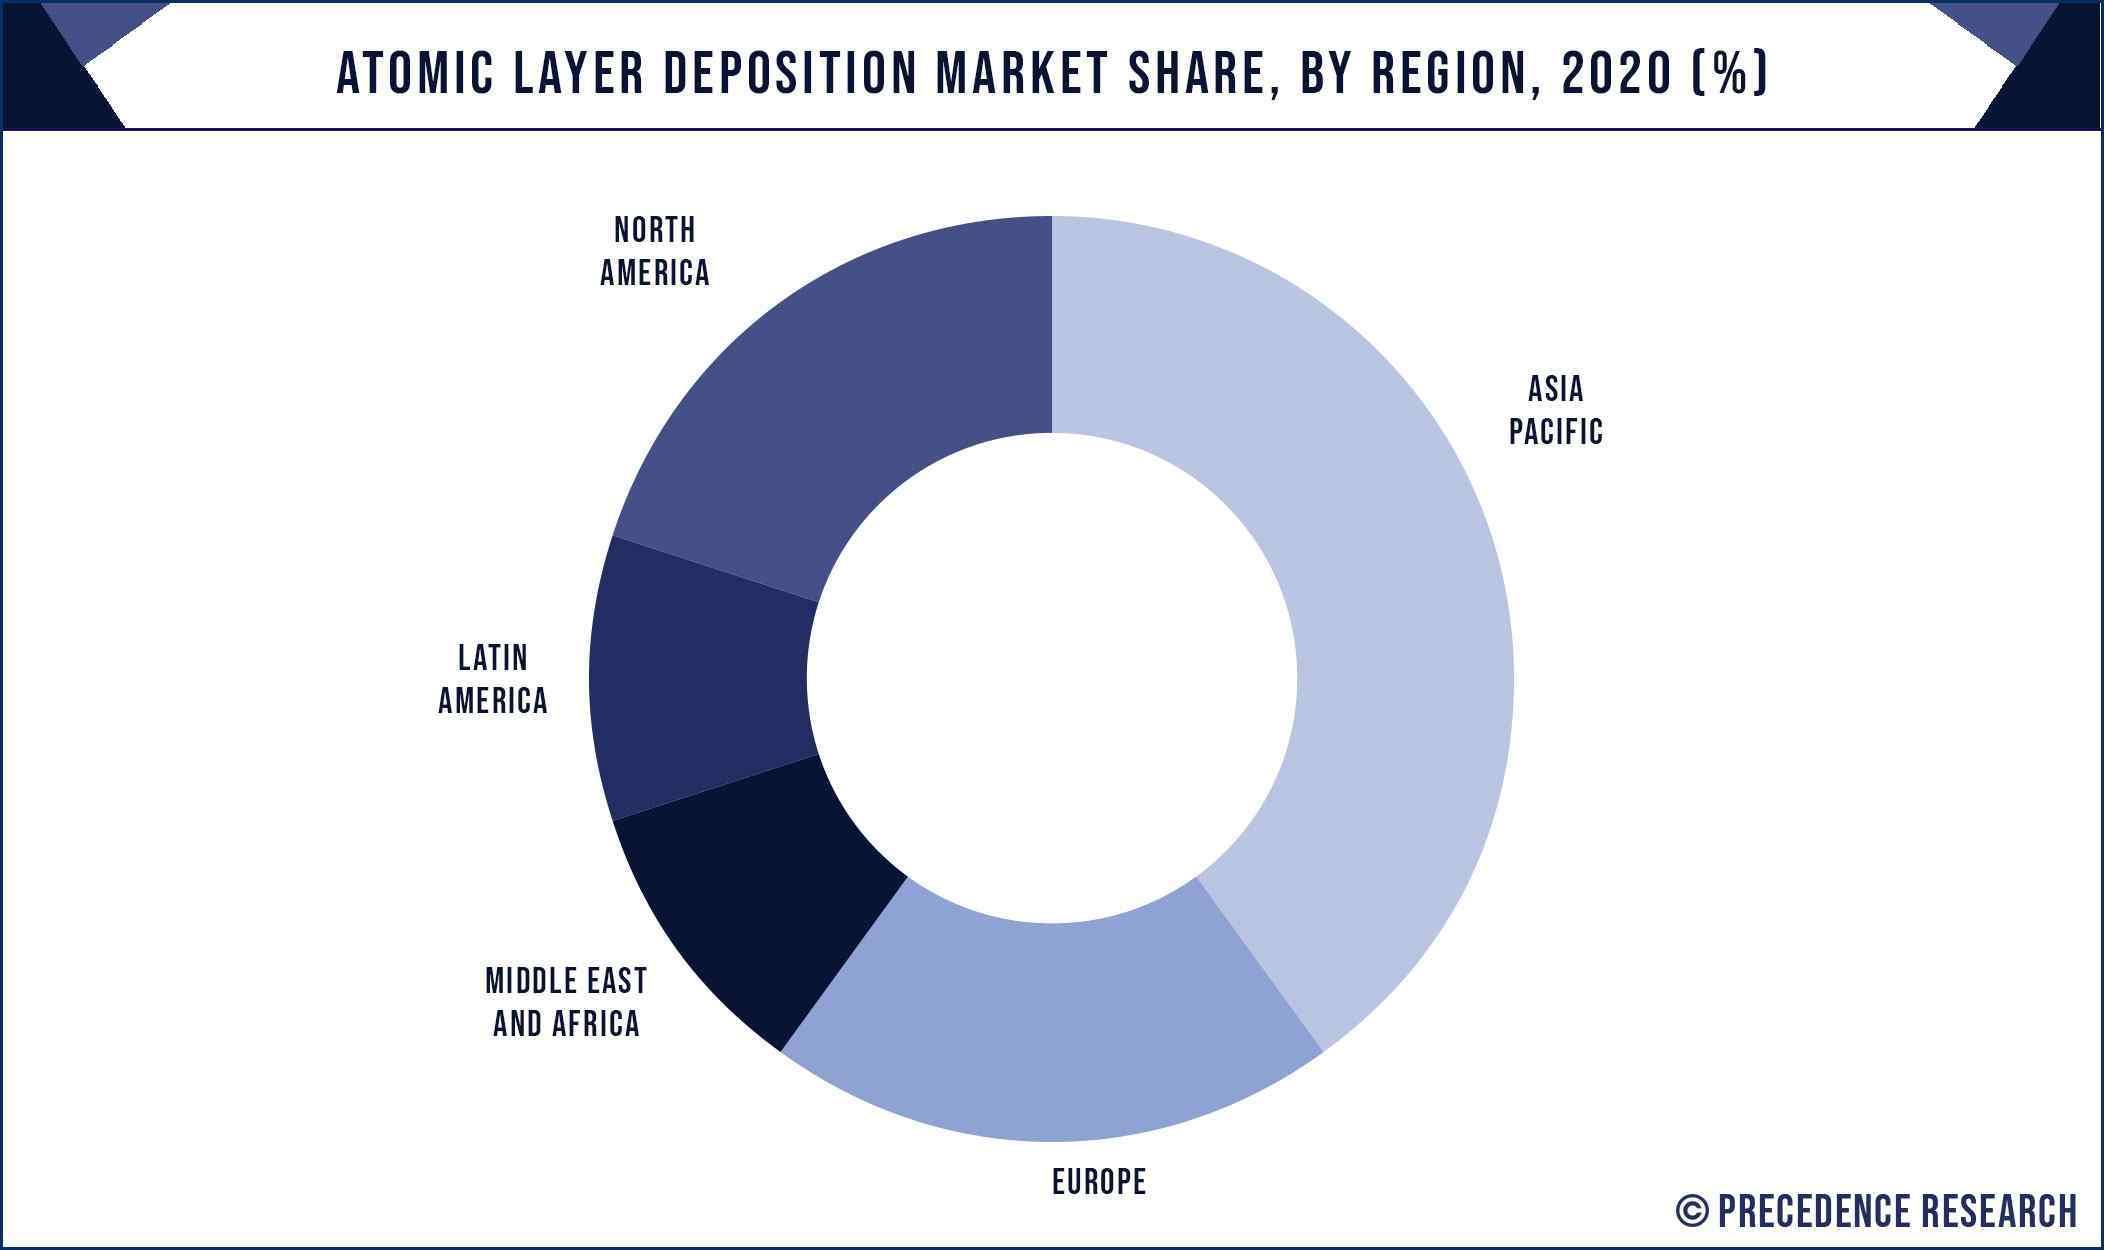 Atomic Layer Deposition Market Share, By Region, 2020 (%)